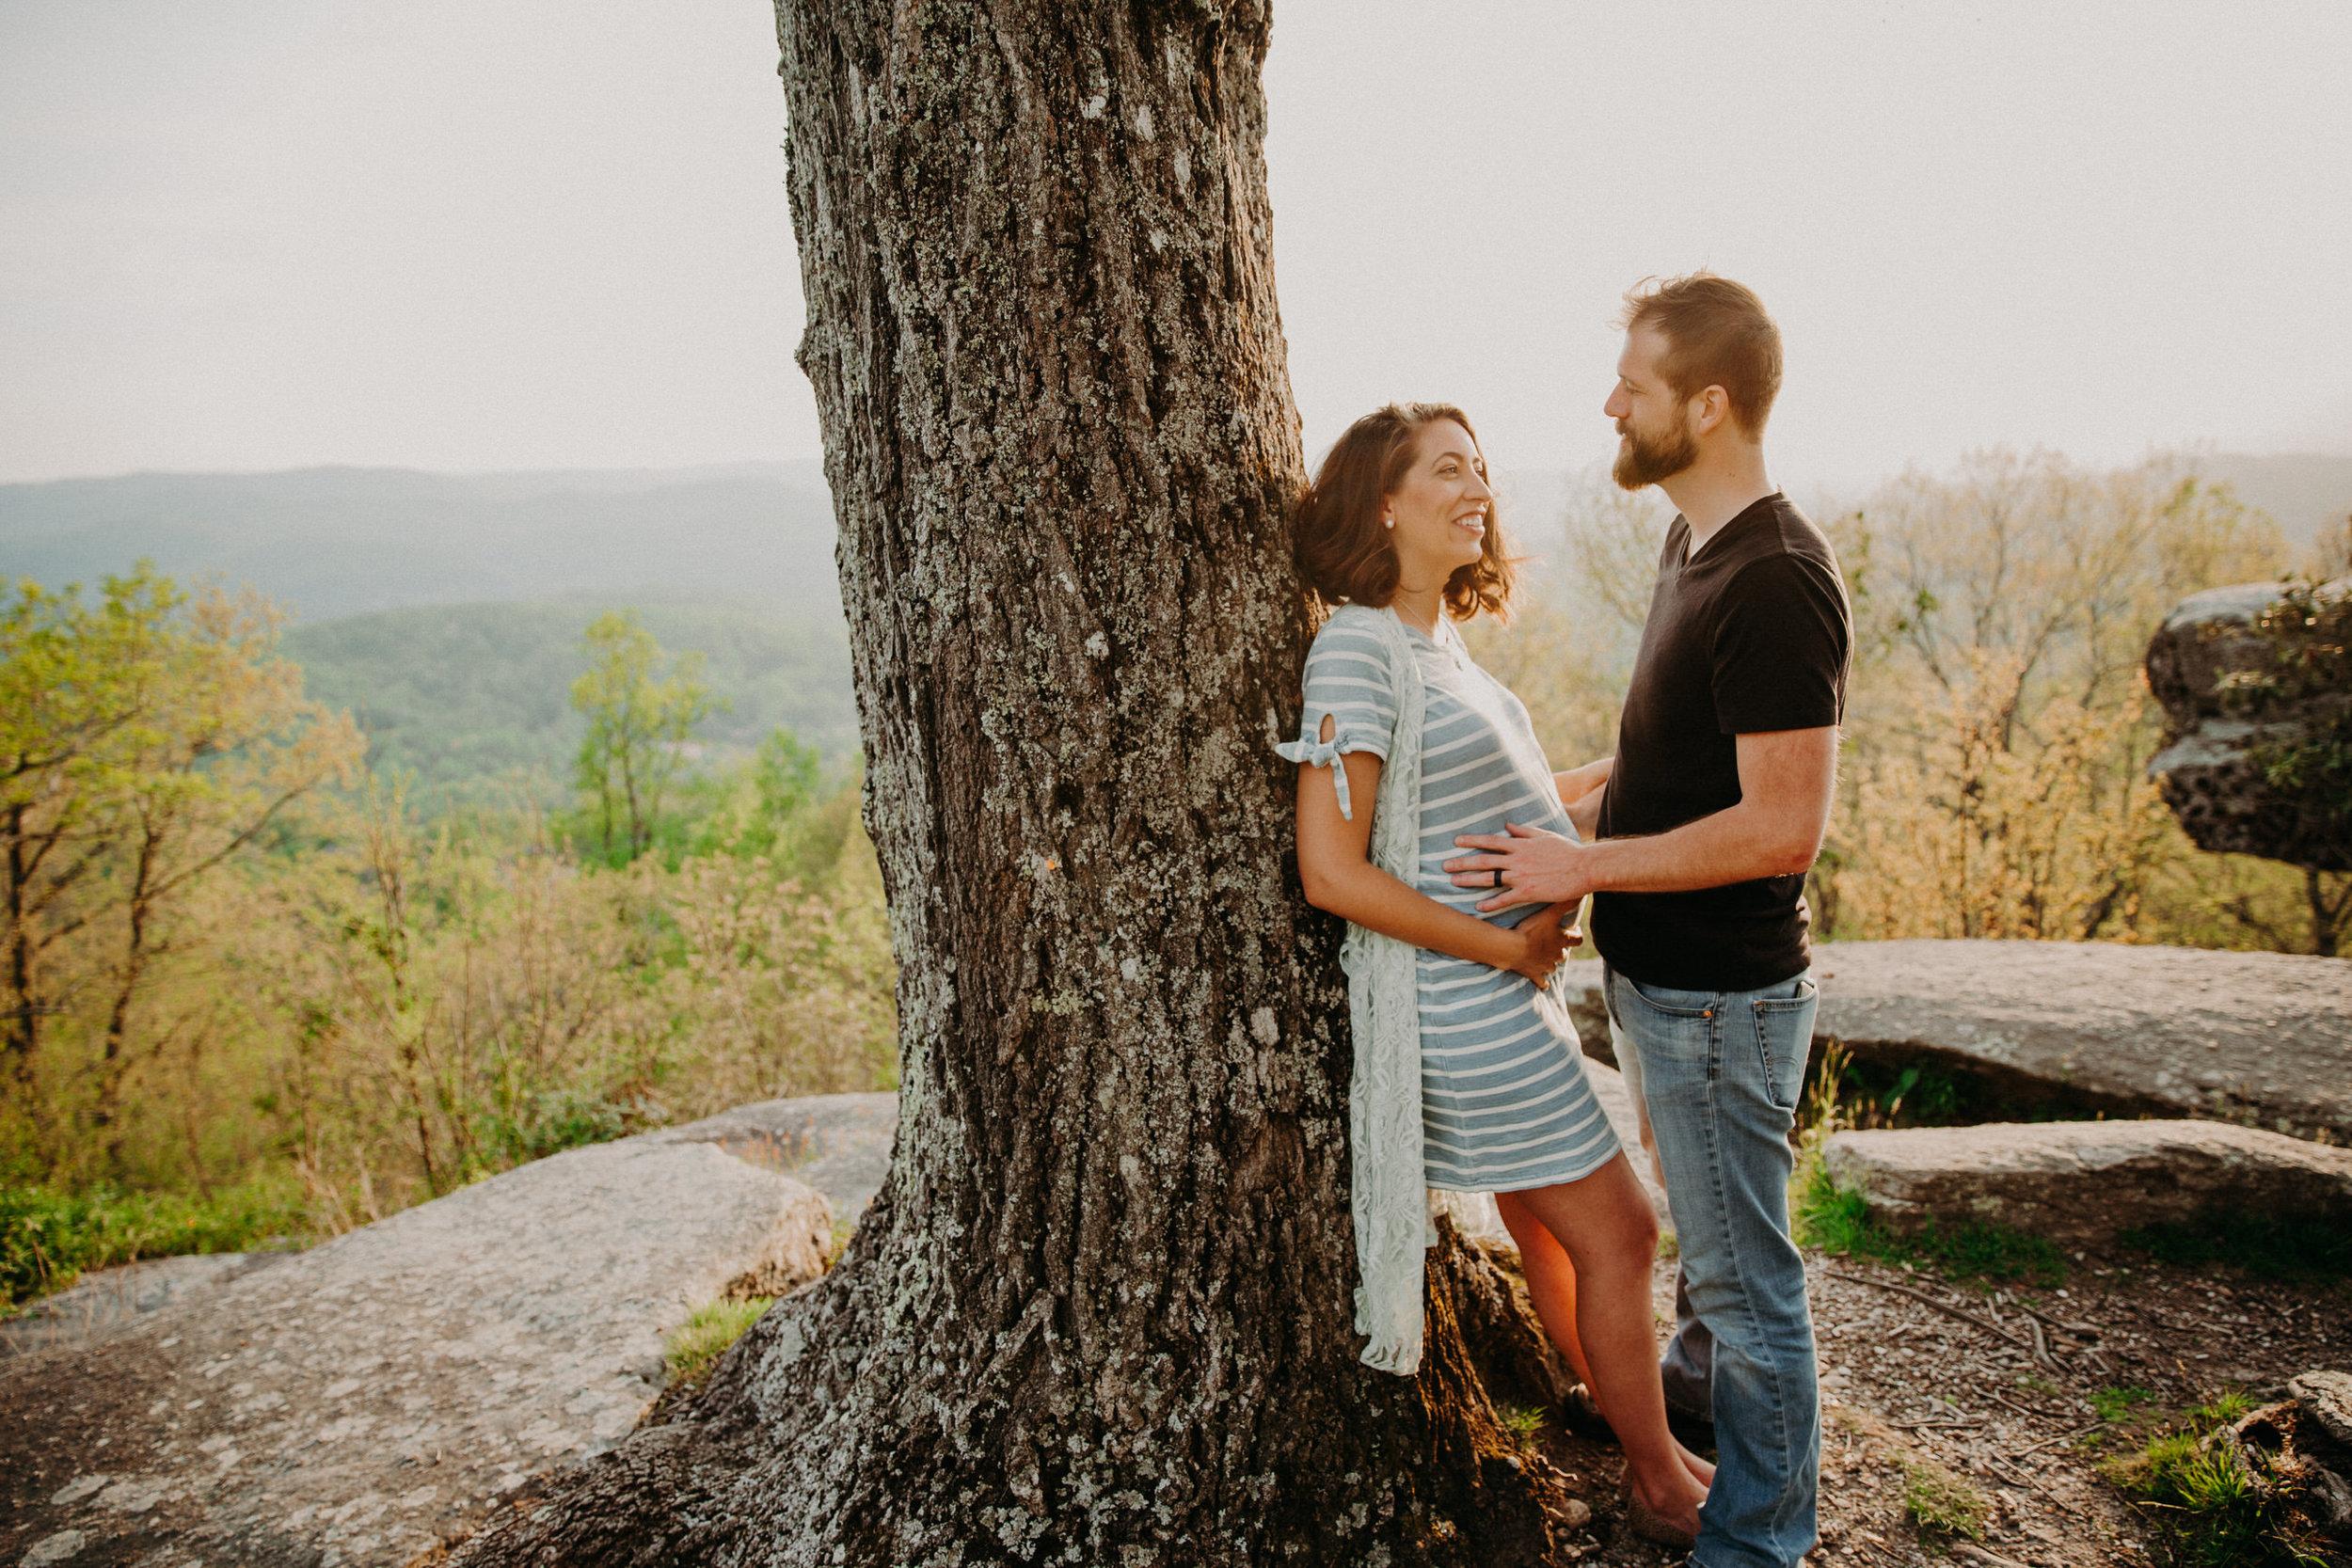 asheville maternity photographer   Taylor heery photography